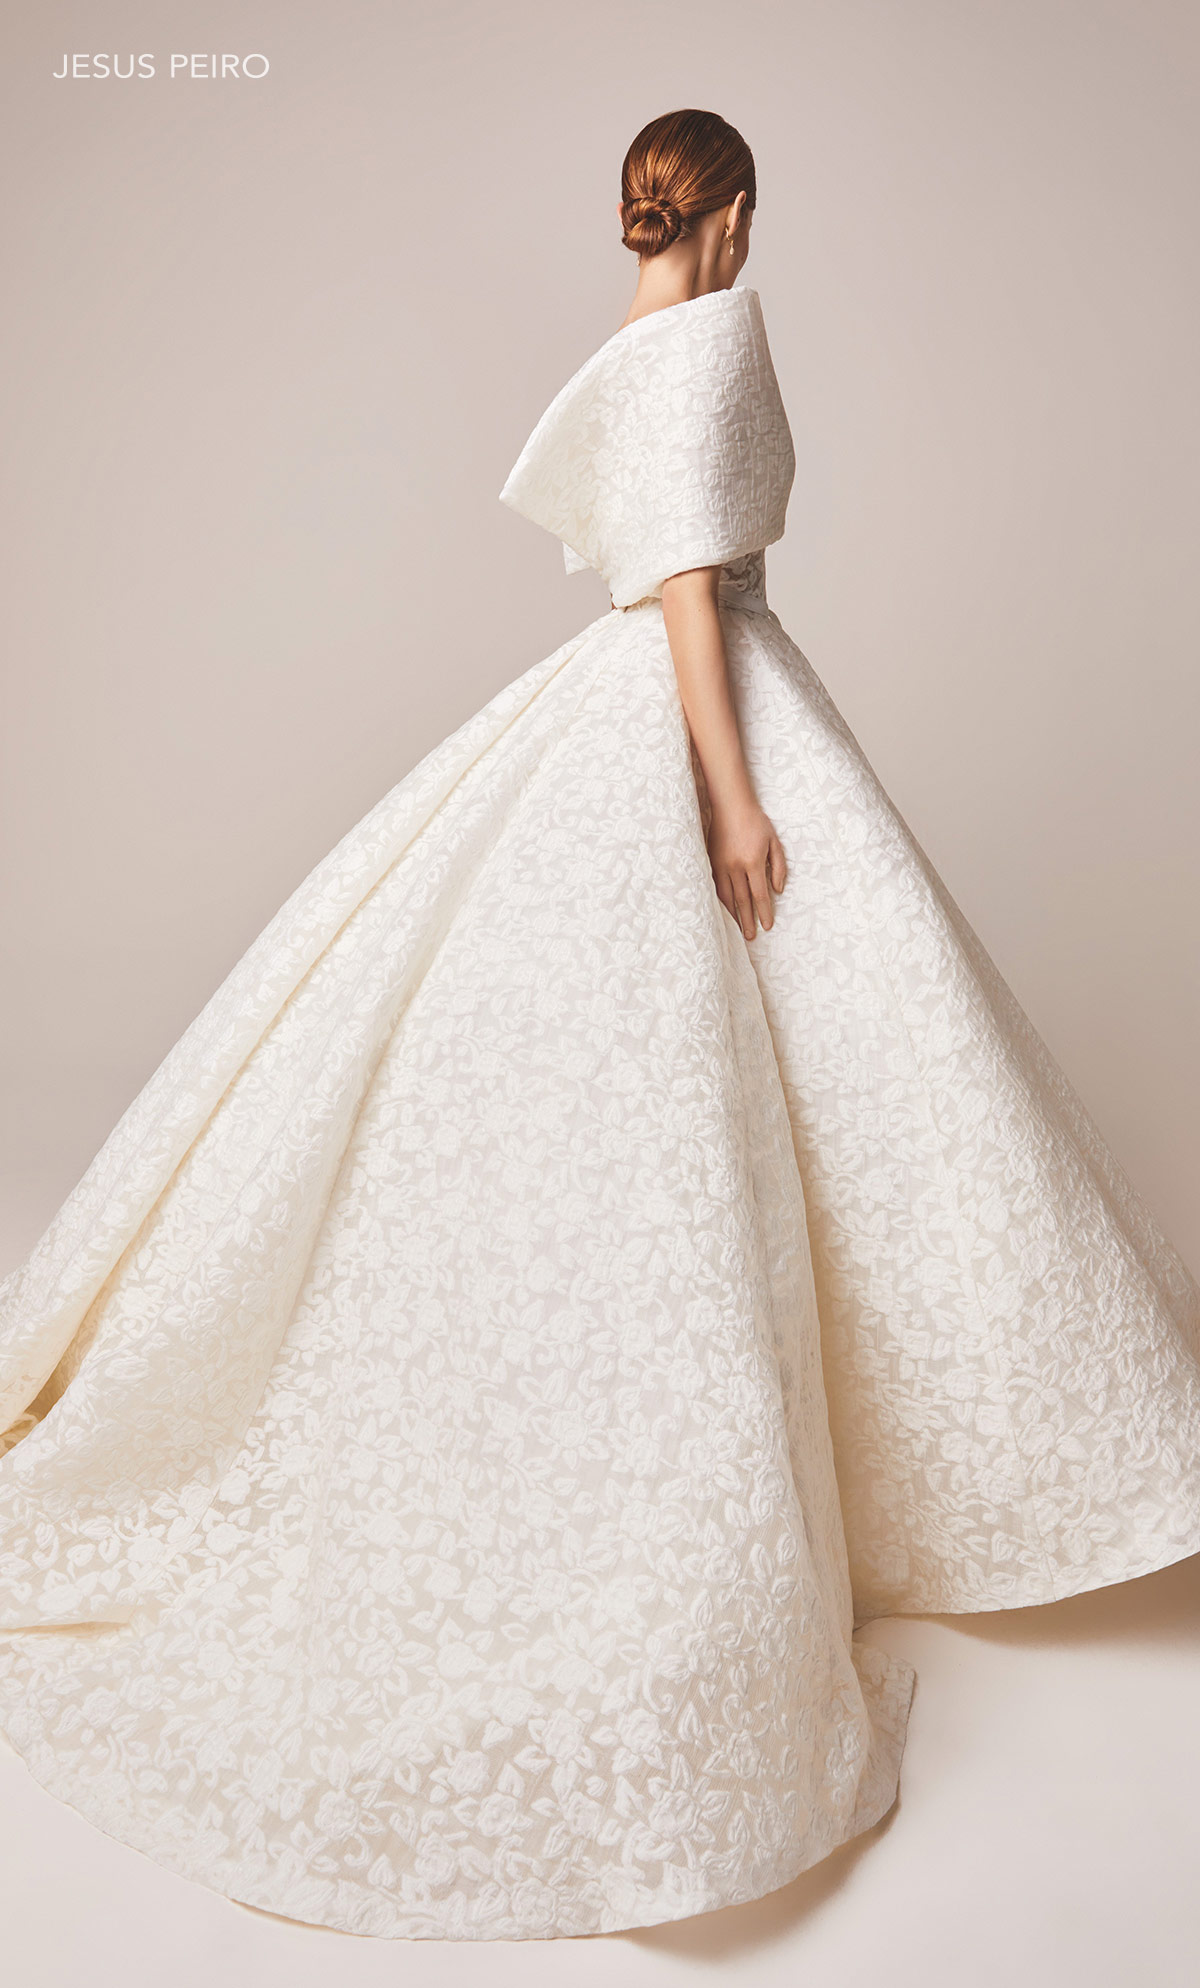 Vestido novia Jesús Peiró Ref.174